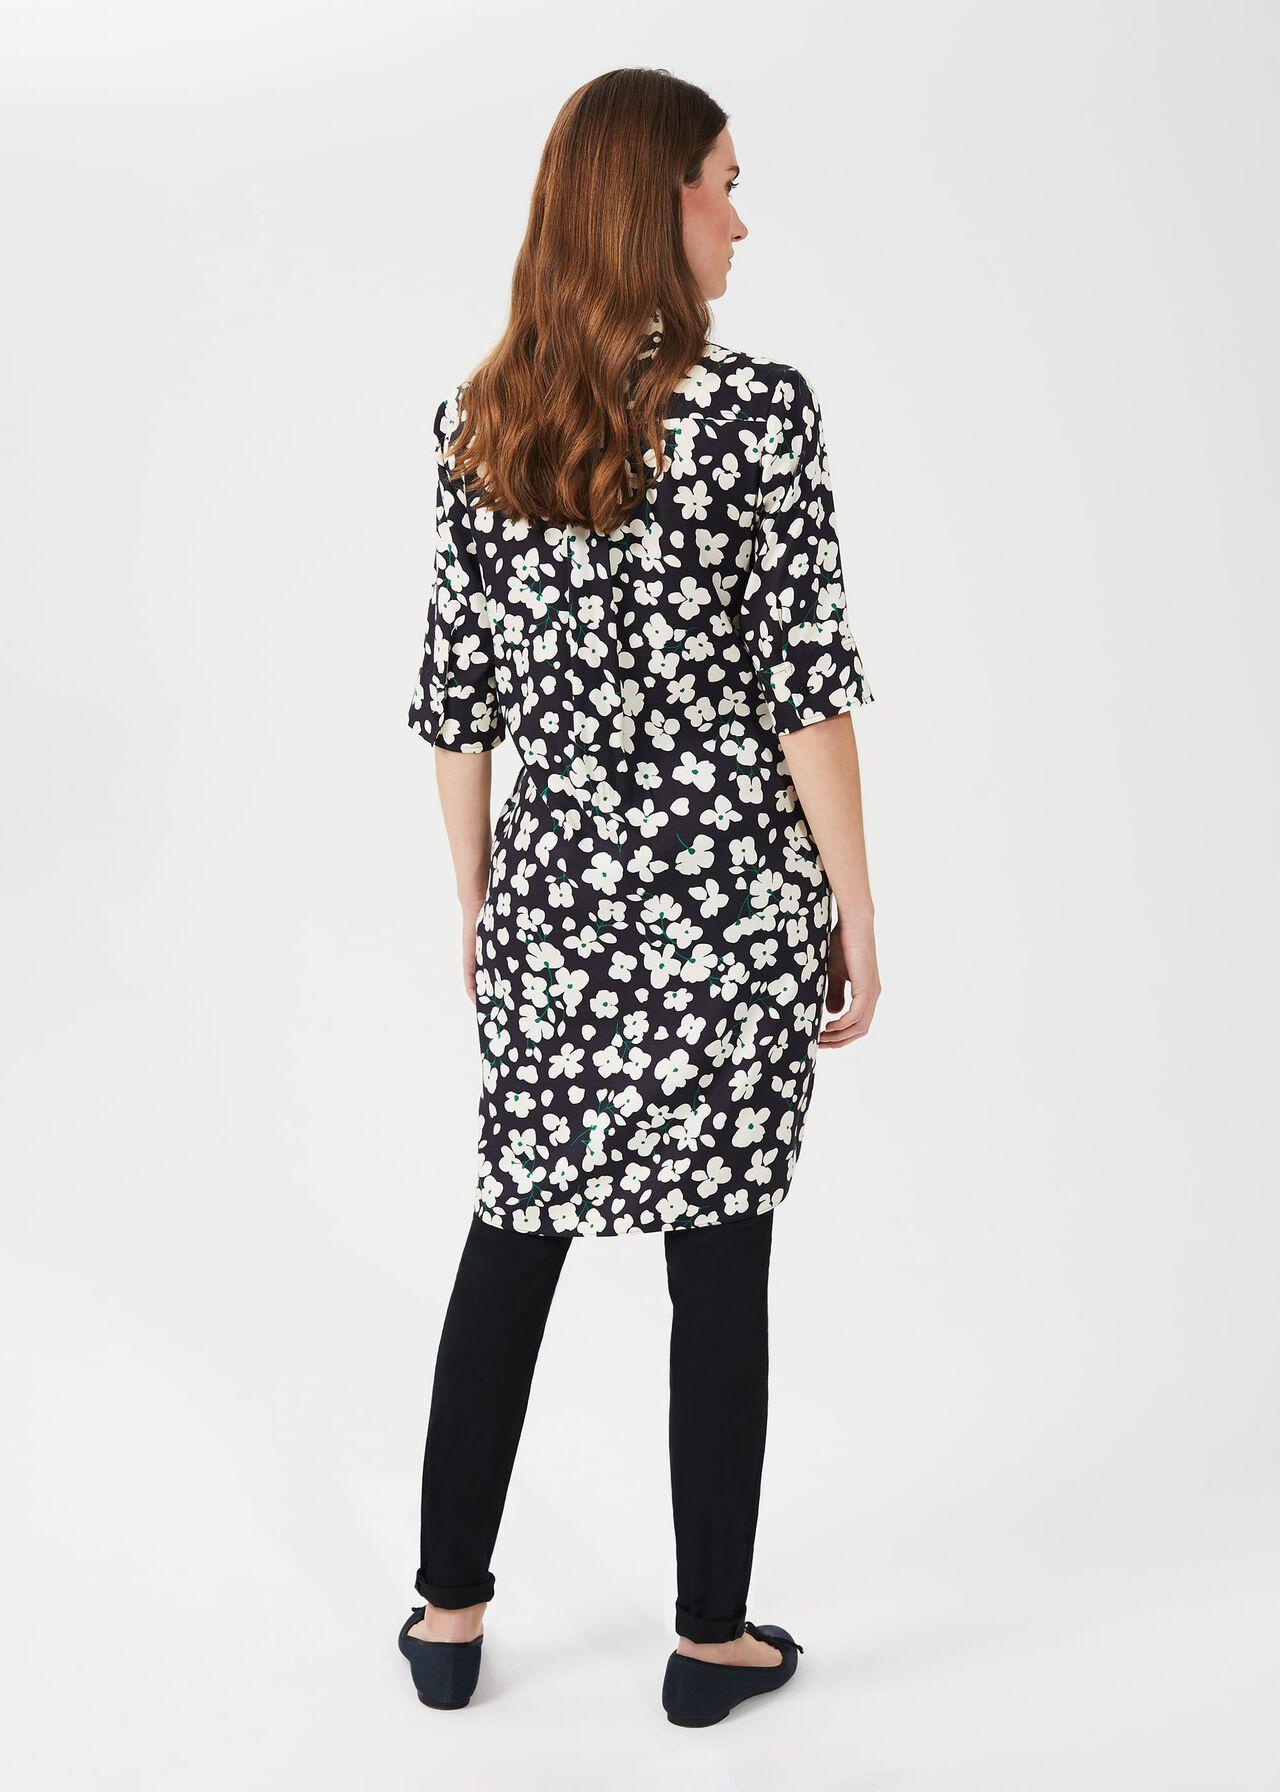 Marciella Floral Tunic Dress, Navy Buttrcream, hi-res